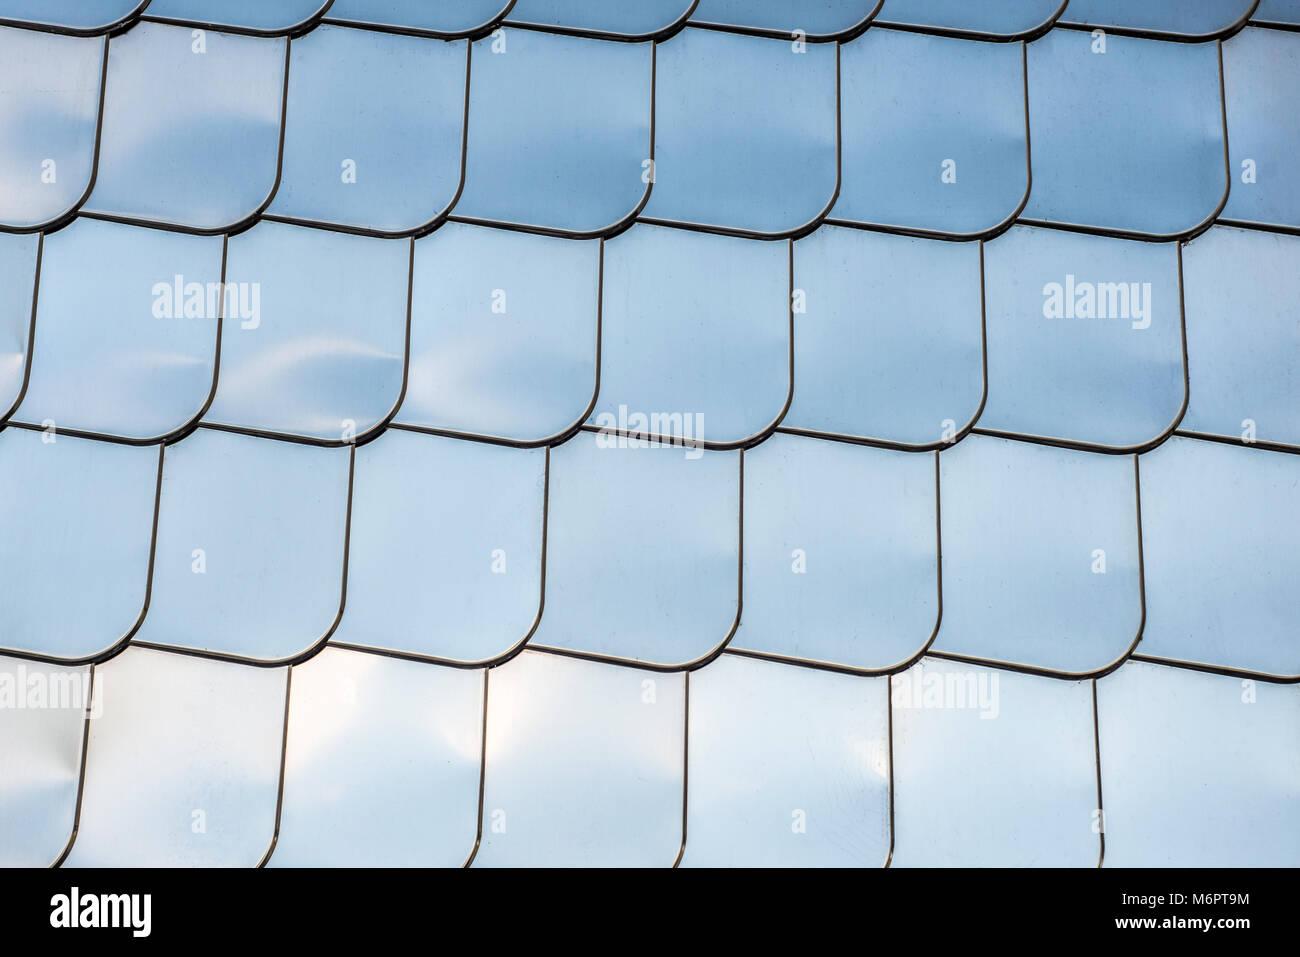 Chrome Reflection Stockfotos & Chrome Reflection Bilder - Alamy